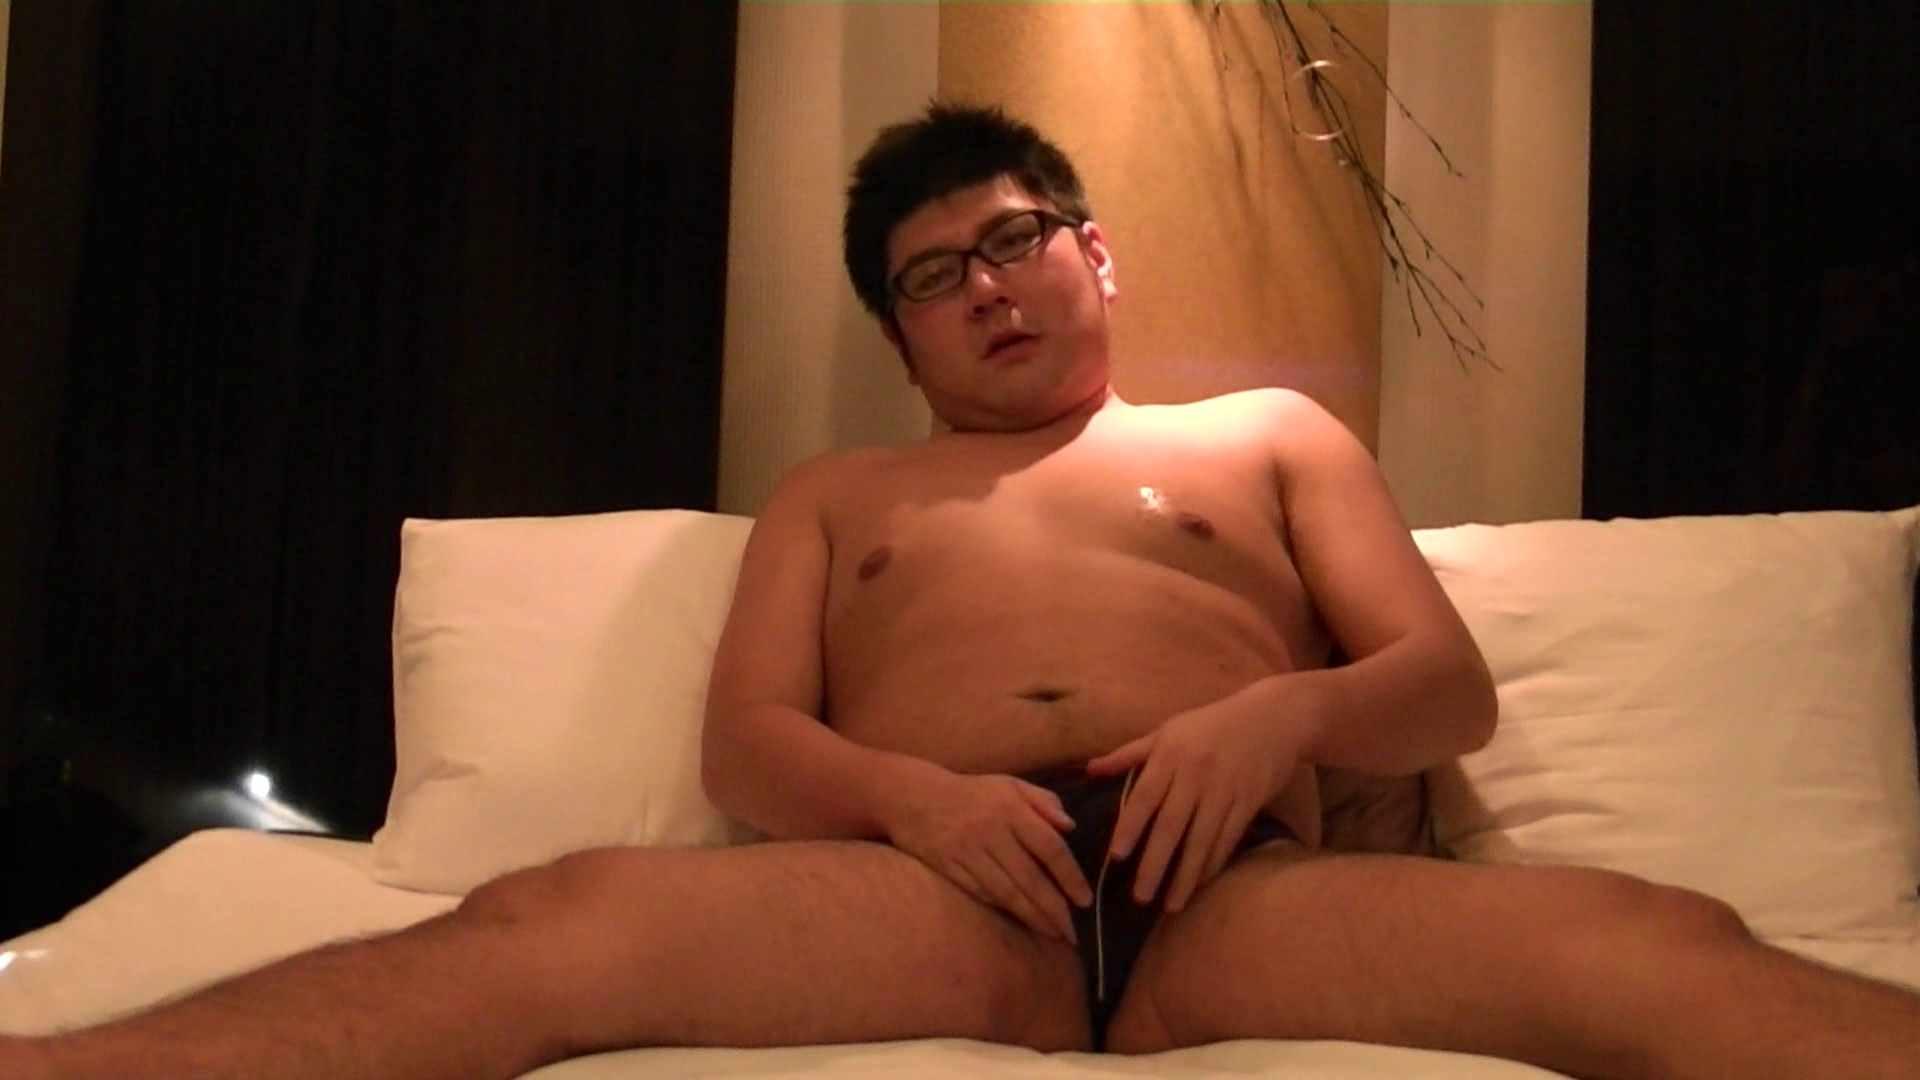 Mr.オナックスさん投稿!HD 貴方のオナニー三万円で撮影させてください。VOL.02 前編 投稿シリーズ ゲイアダルトビデオ画像 105連発 47